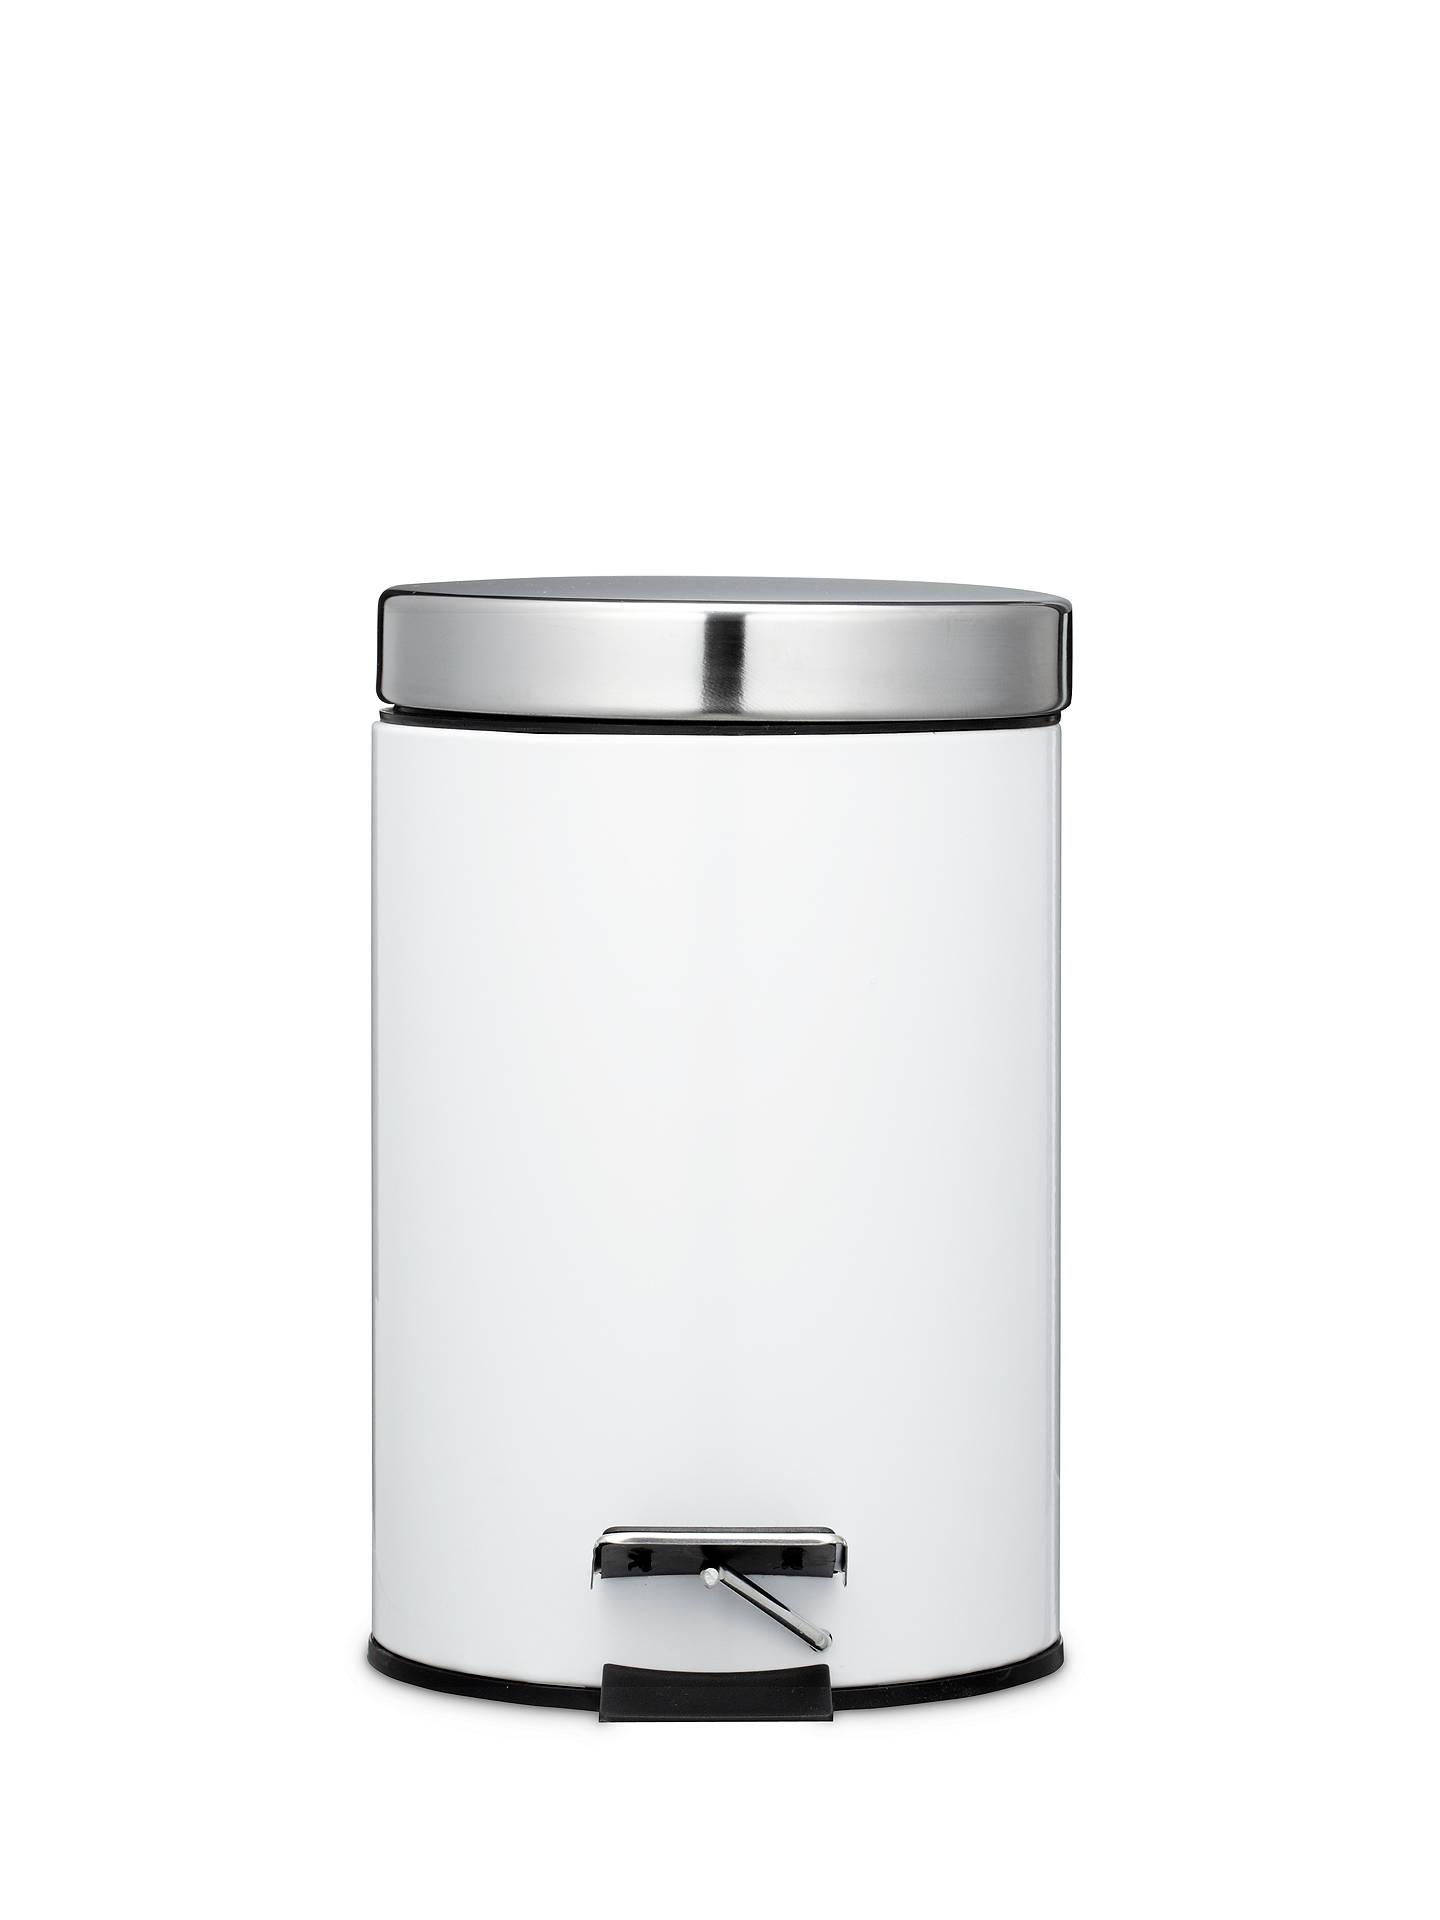 john lewis partners new york white gloss pedal bin 3l. Black Bedroom Furniture Sets. Home Design Ideas